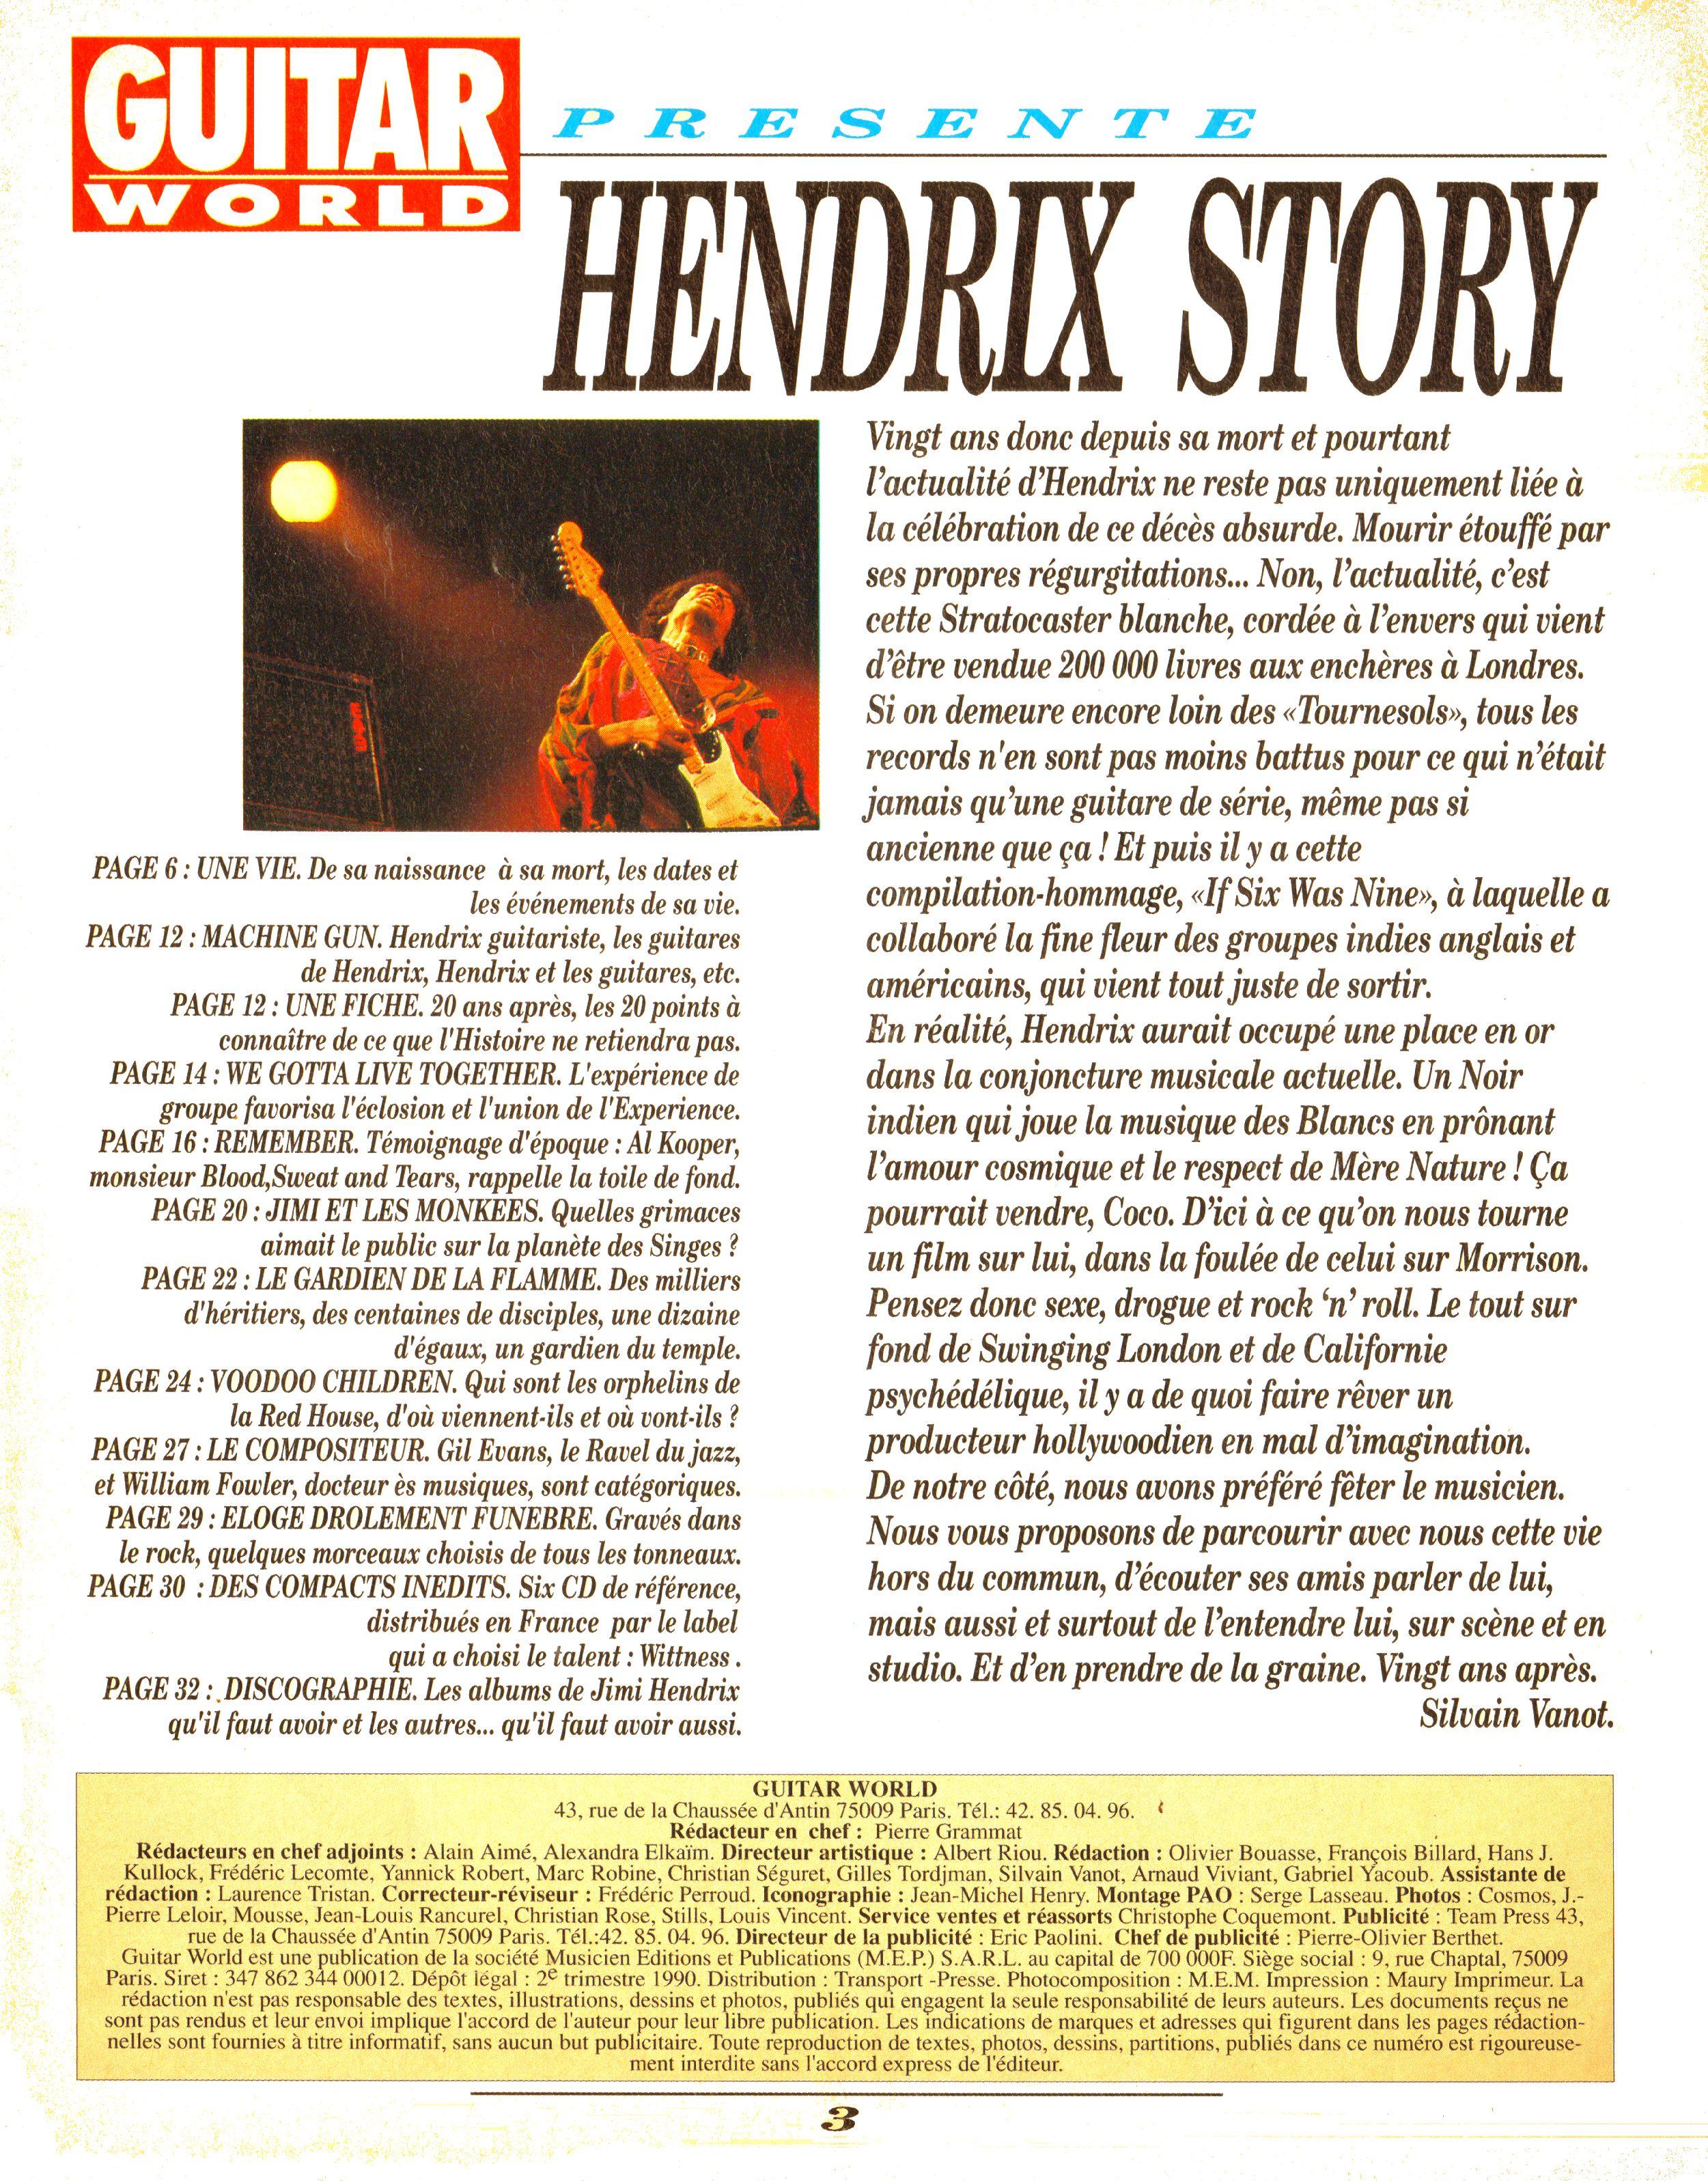 Magazines Français 1989 - 2014 GuitarWorldAvrilMaiJuin1990Page03